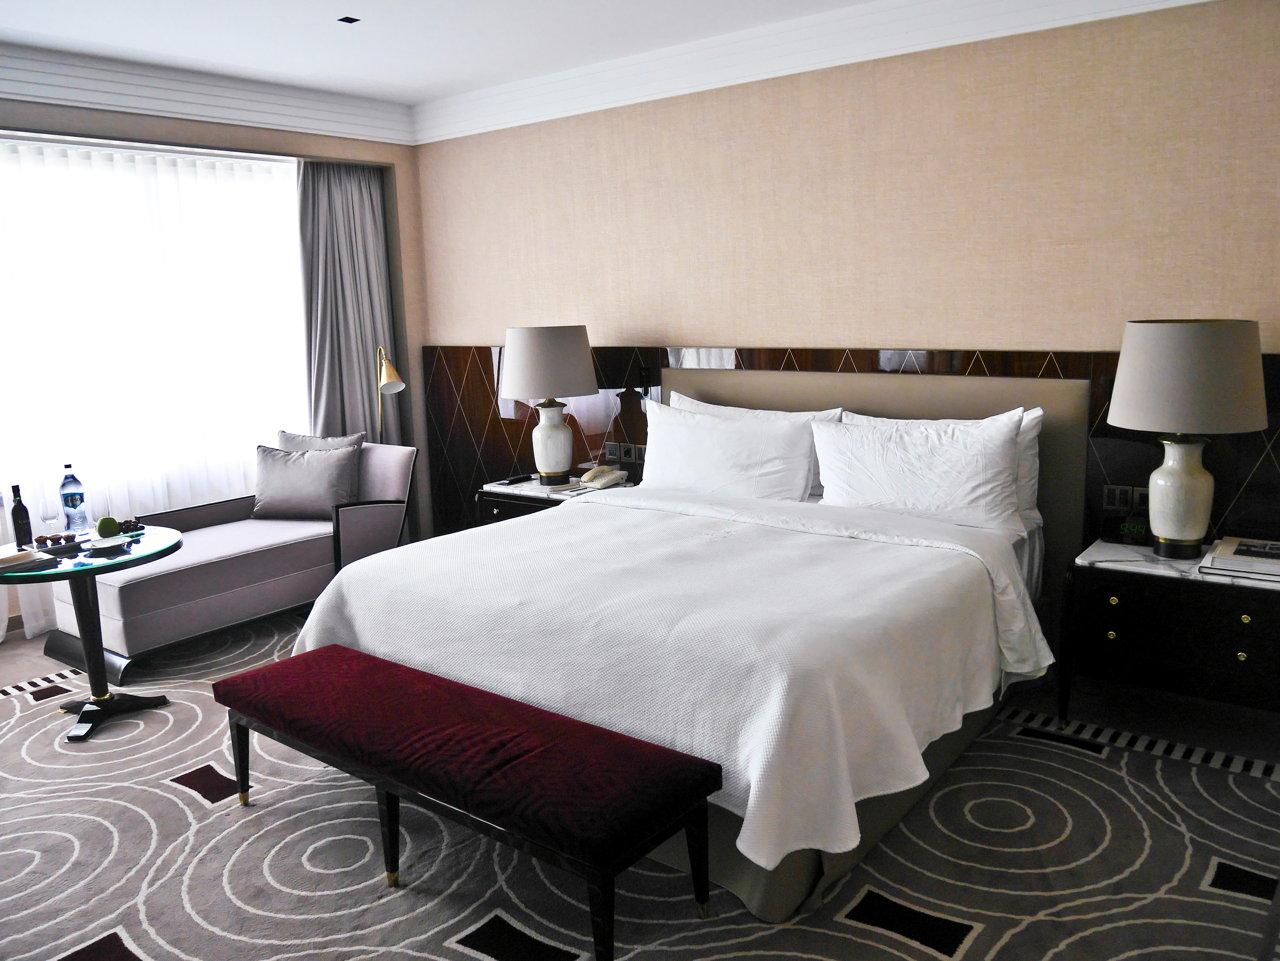 Four Seasons Hotel Ritz Room